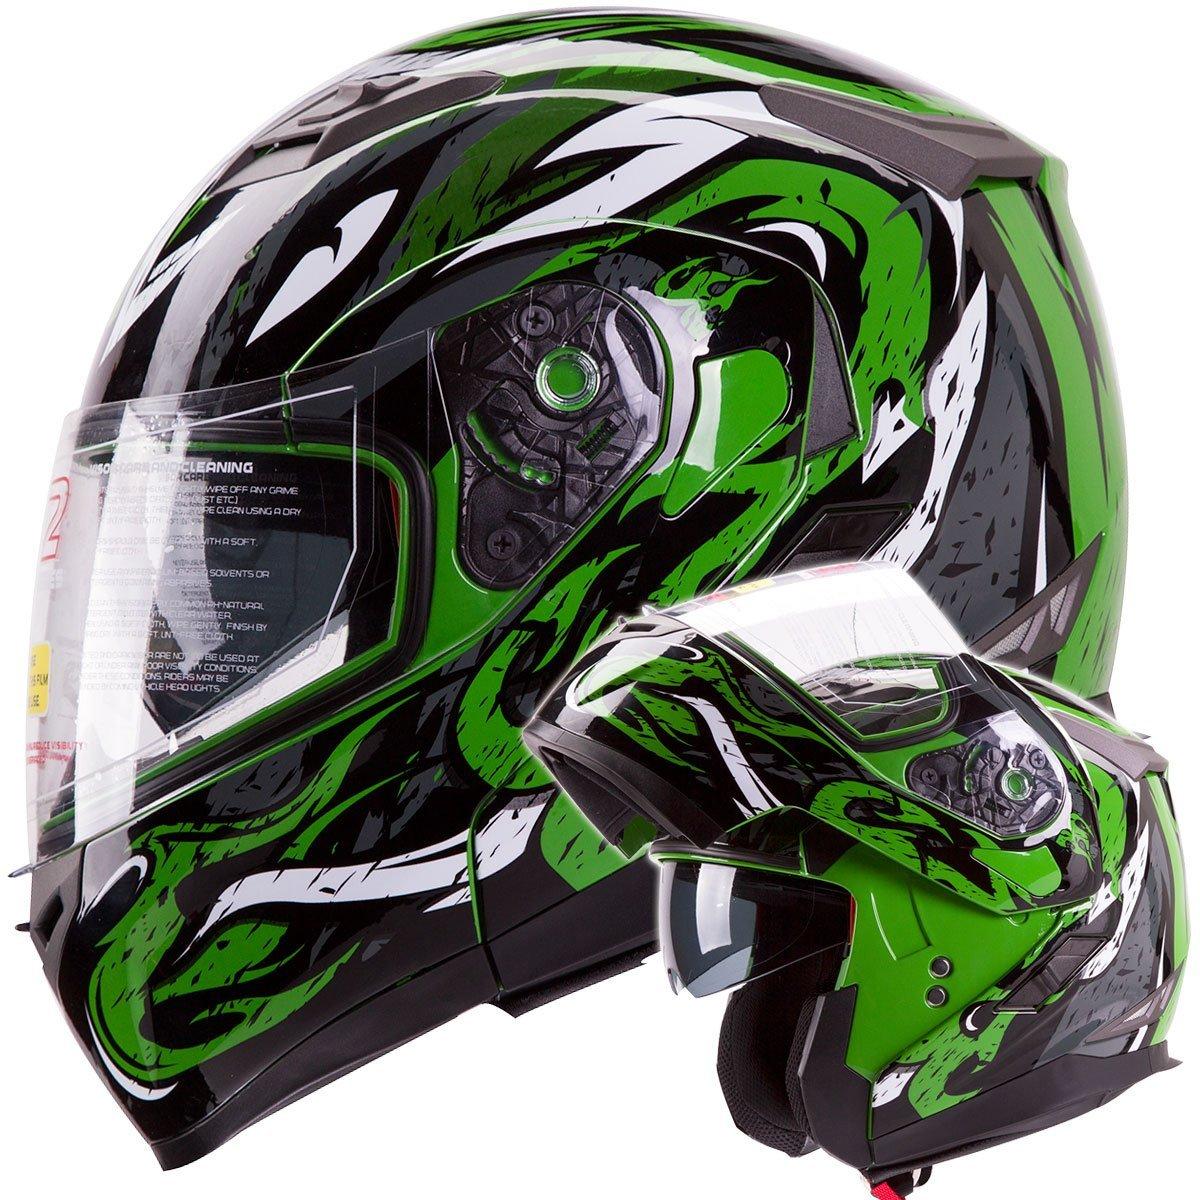 04678957 IV2 Green VIPER Dual Visor Modular Flip-Up Motorcycle Adventure Touring  Helmet [DOT]